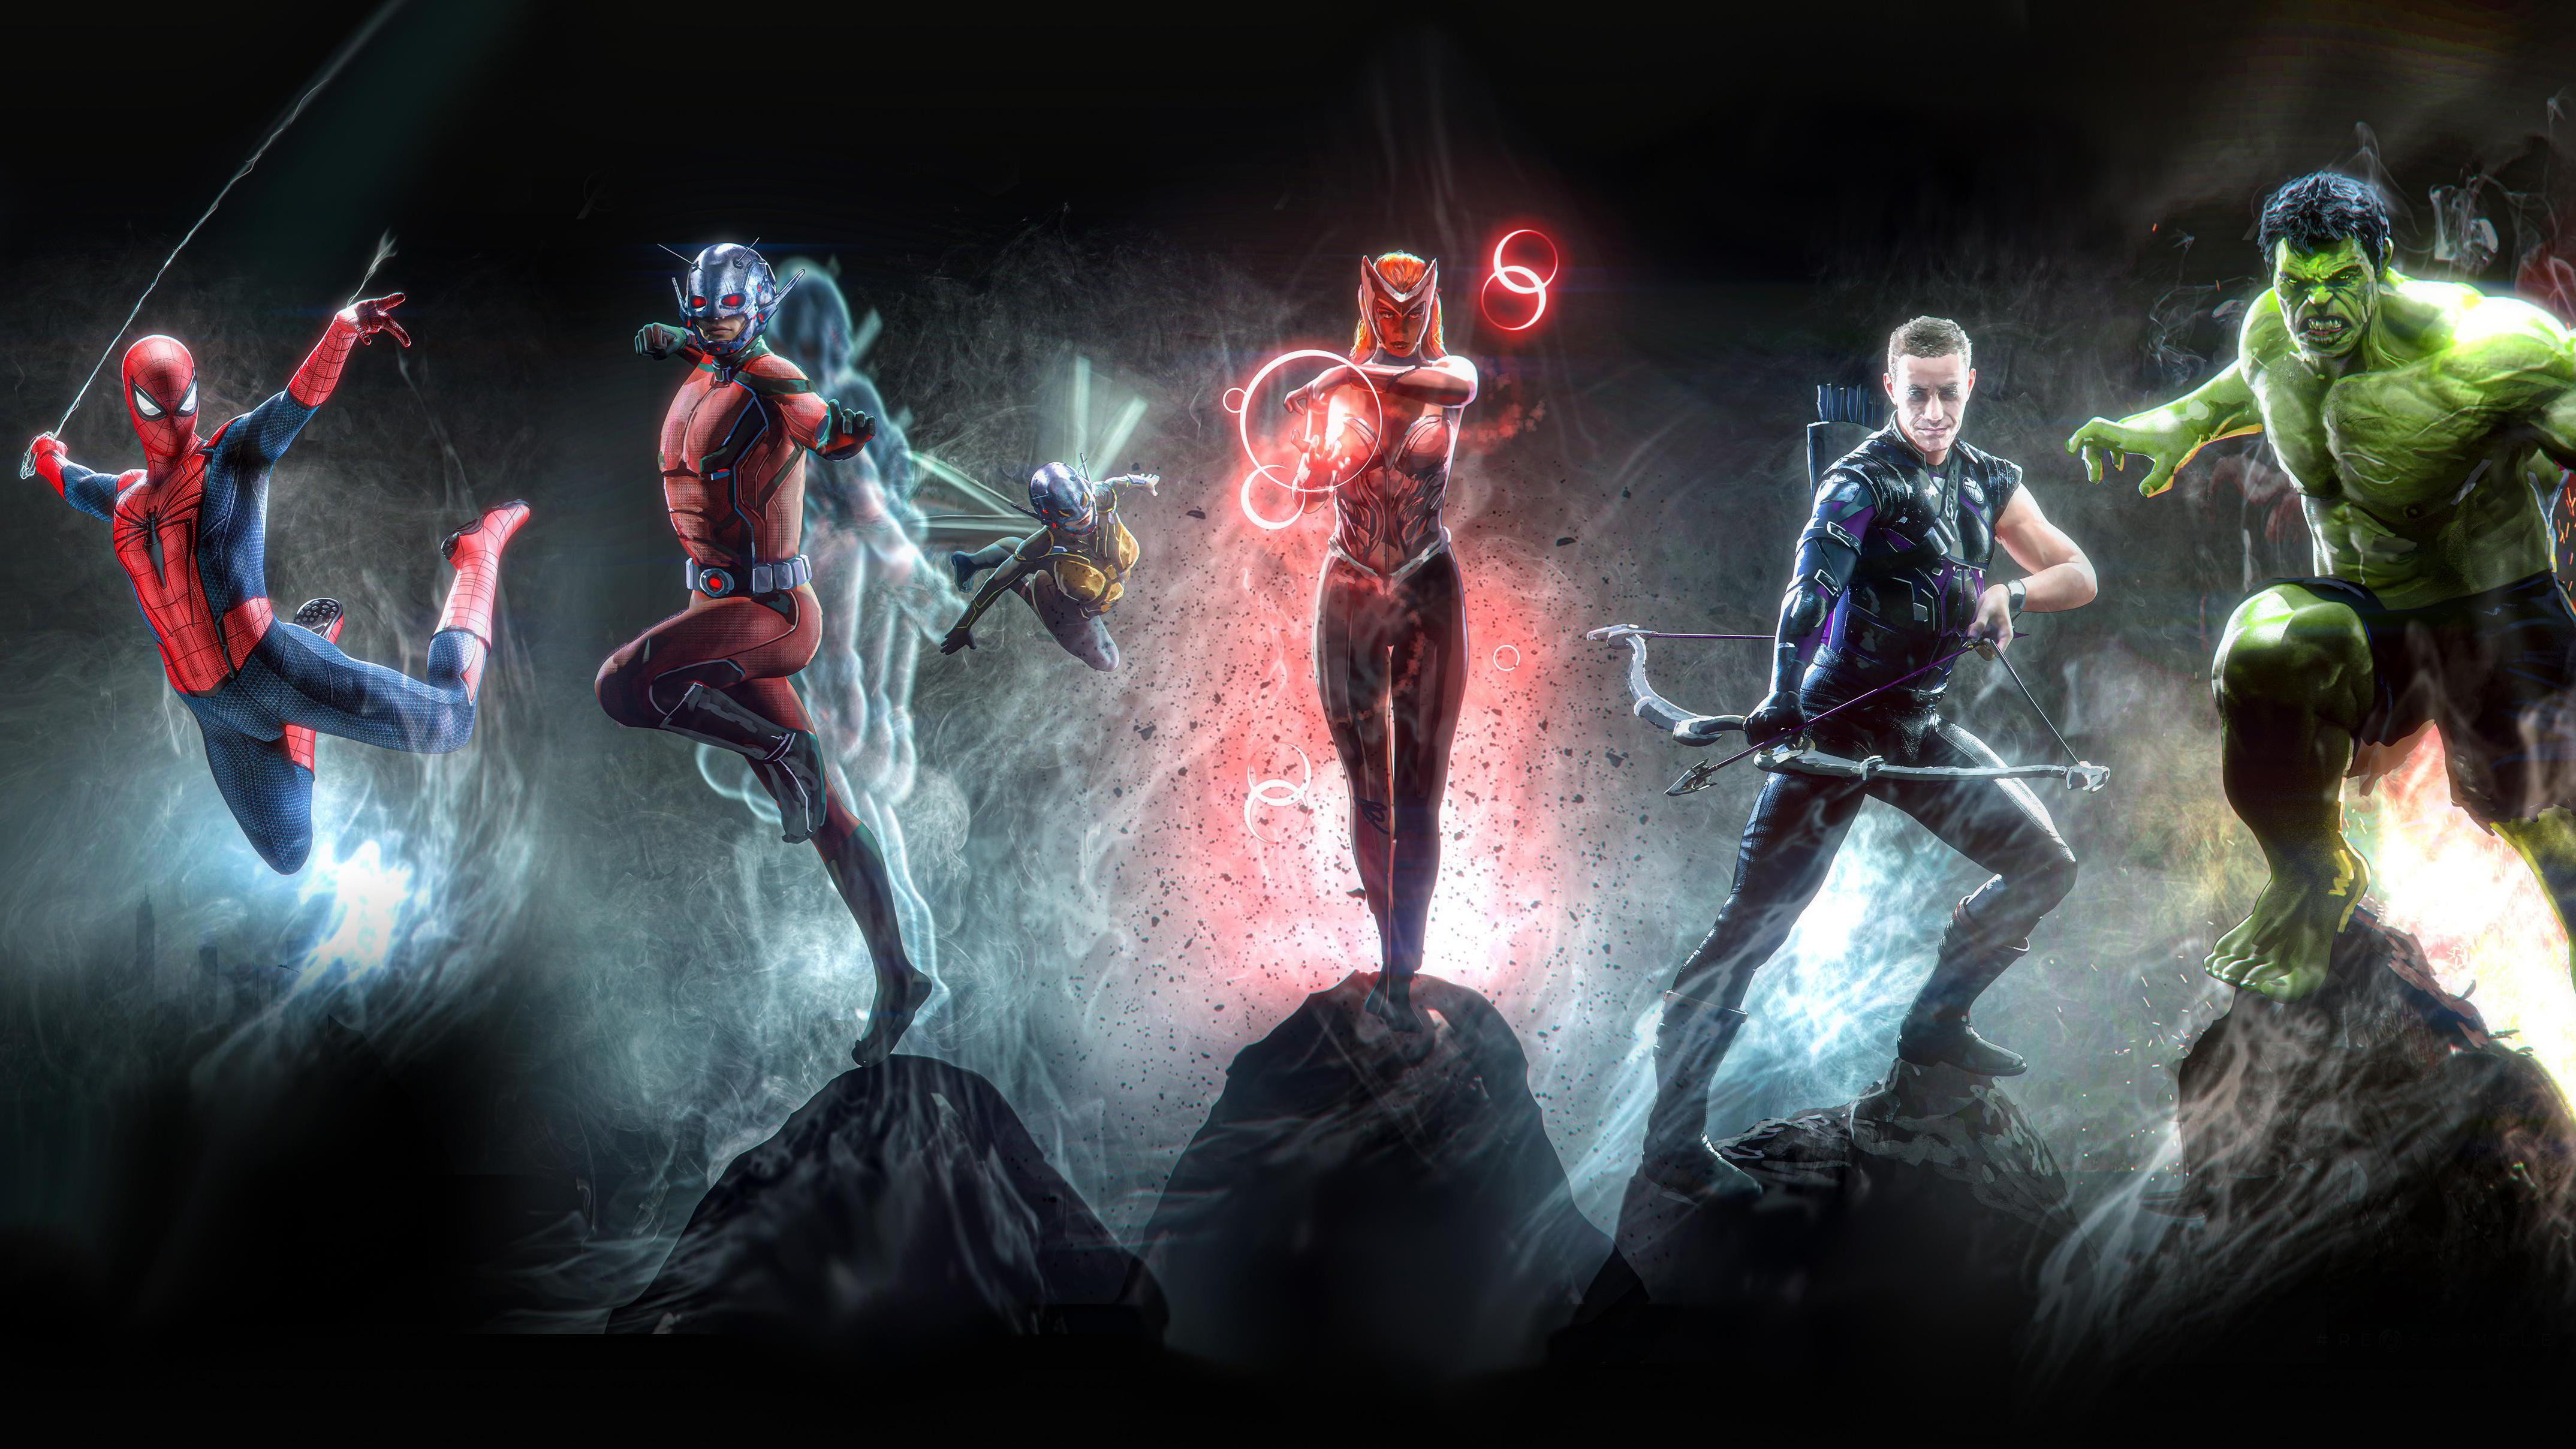 Marvel 4k Artwork, HD Superheroes, 4k Wallpapers, Images ...